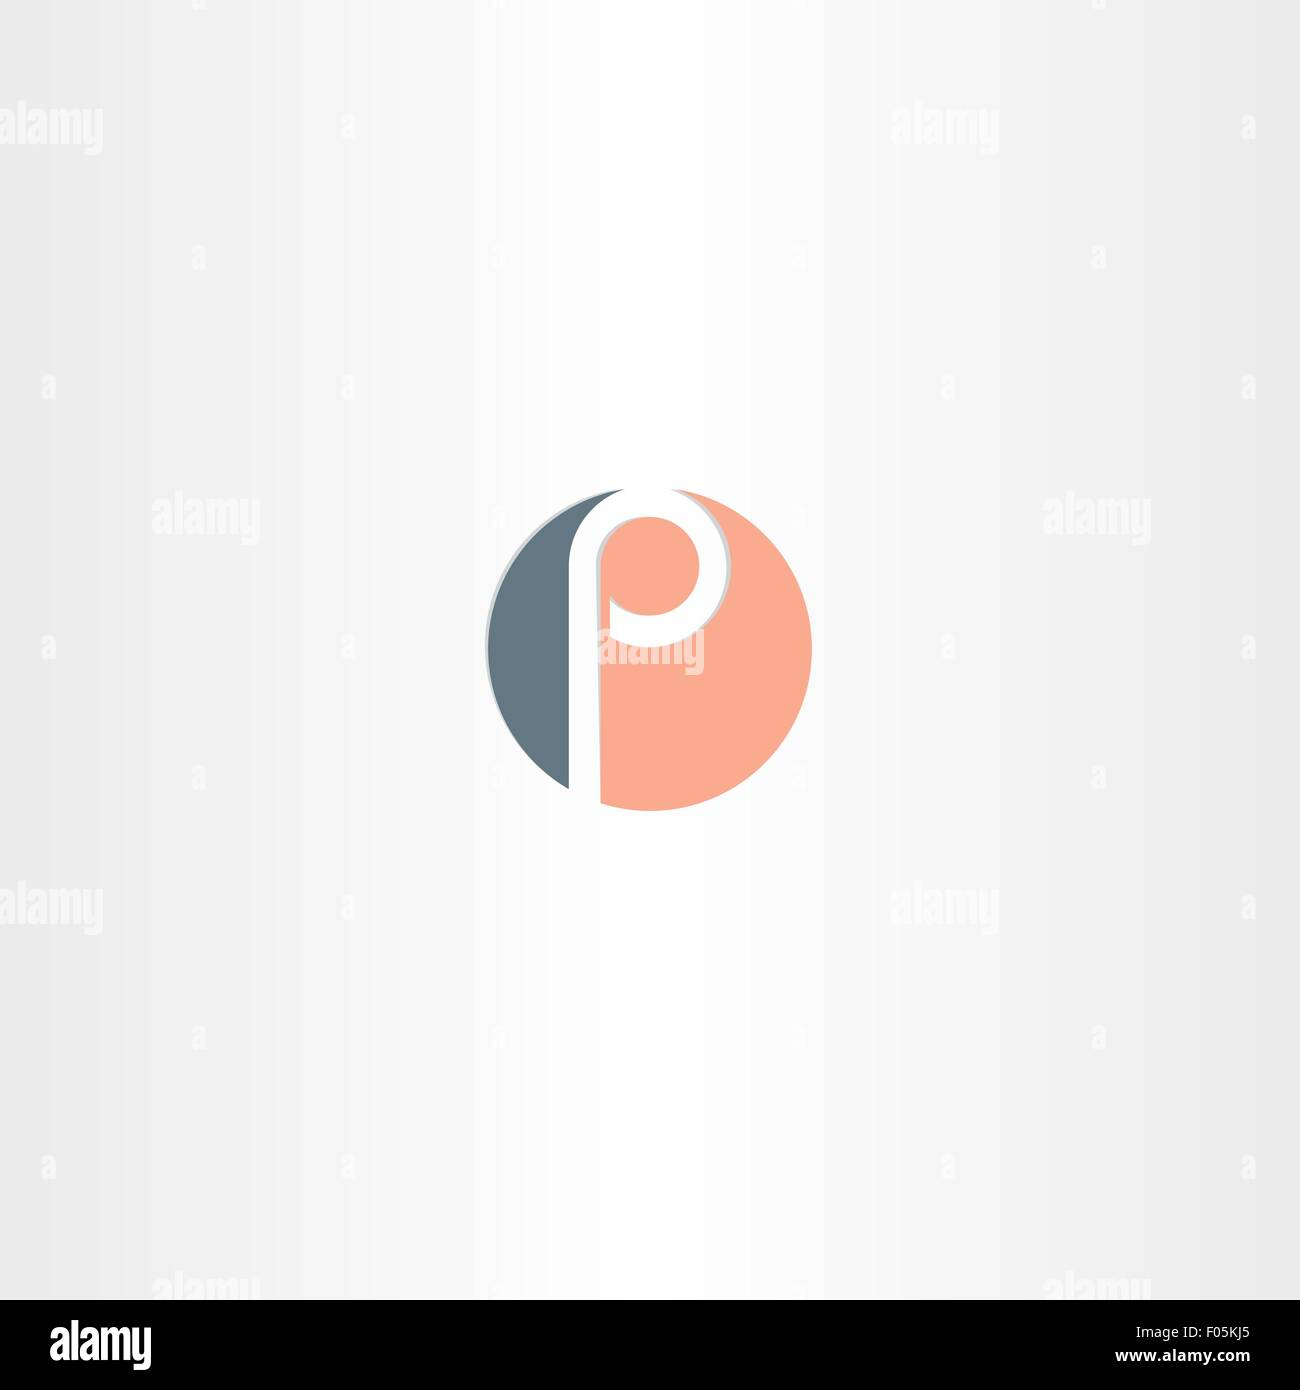 Circle icon letter p vector logo symbol element design stock circle icon letter p vector logo symbol element design biocorpaavc